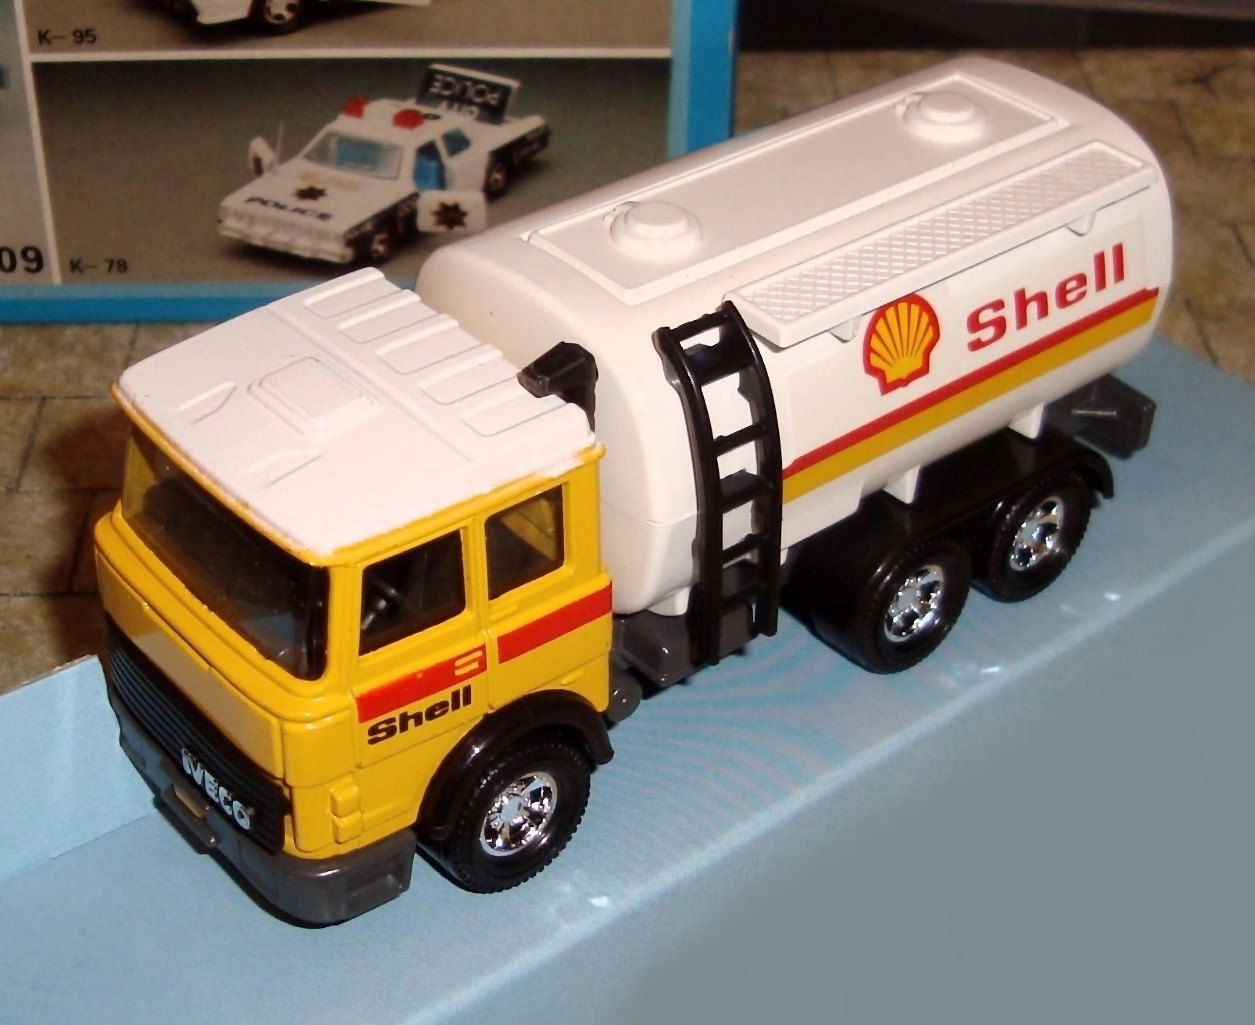 Petrol Tanker (K-109/K-131)